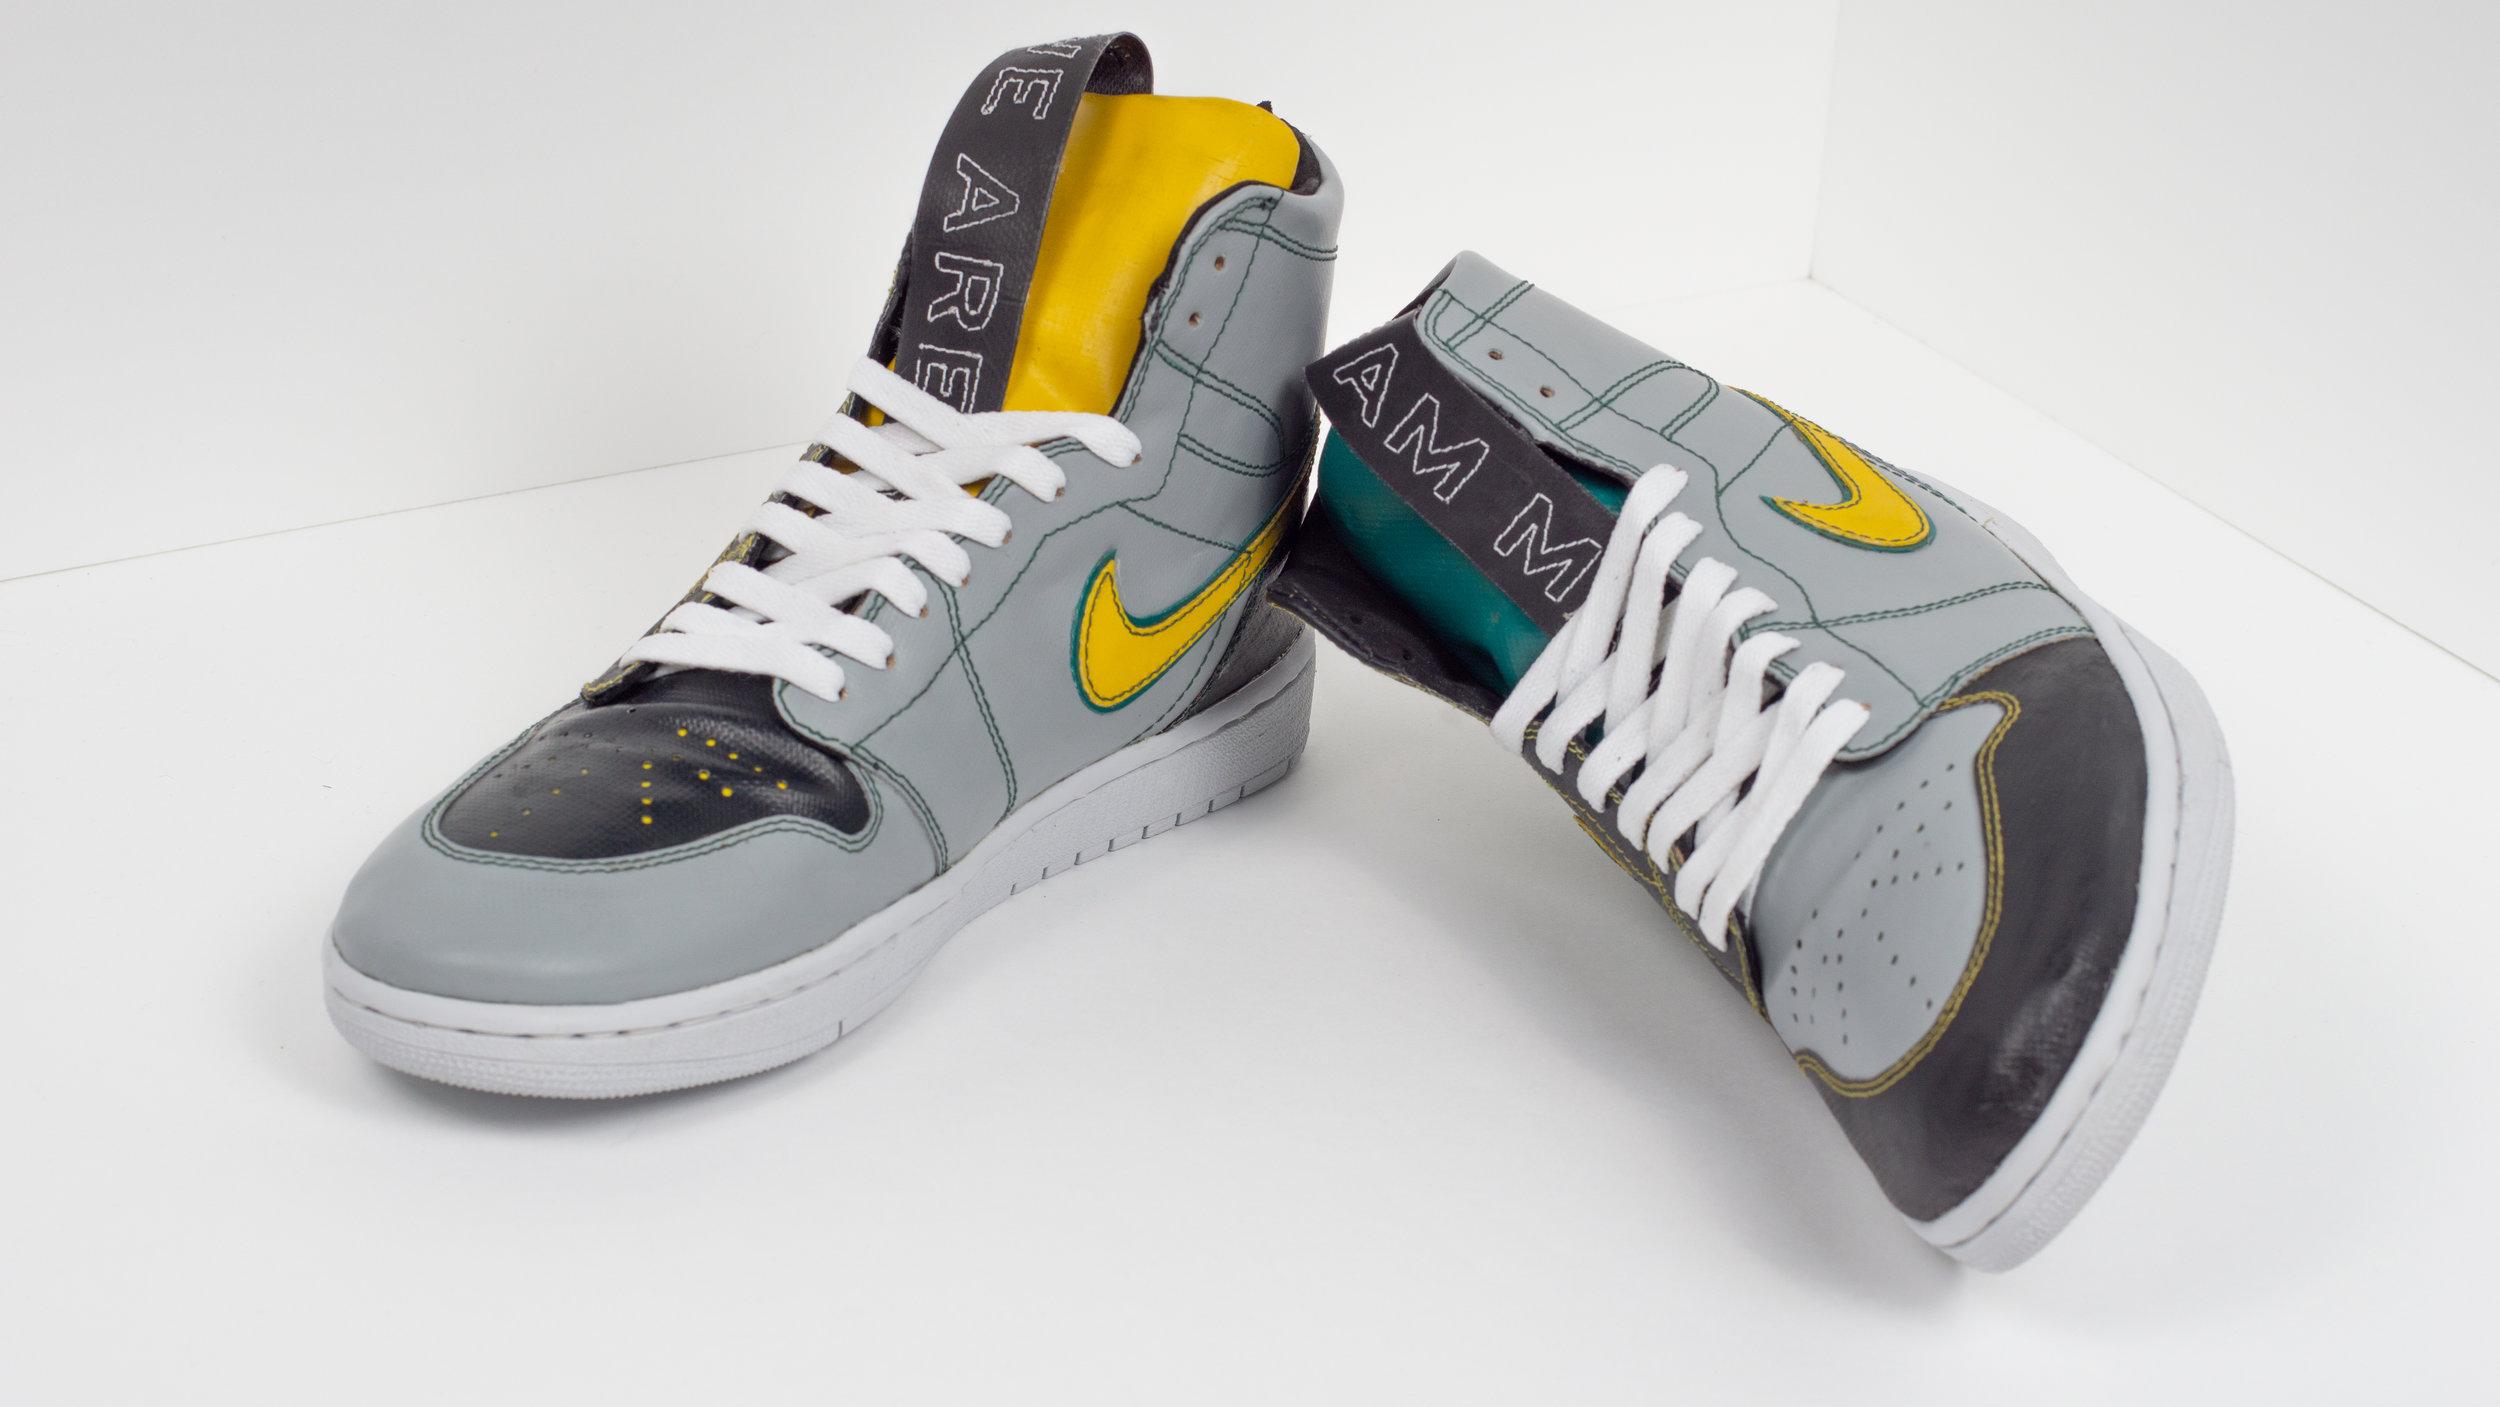 mimycri x Lars Trucks Jordan 1 Sneakers from mimycri